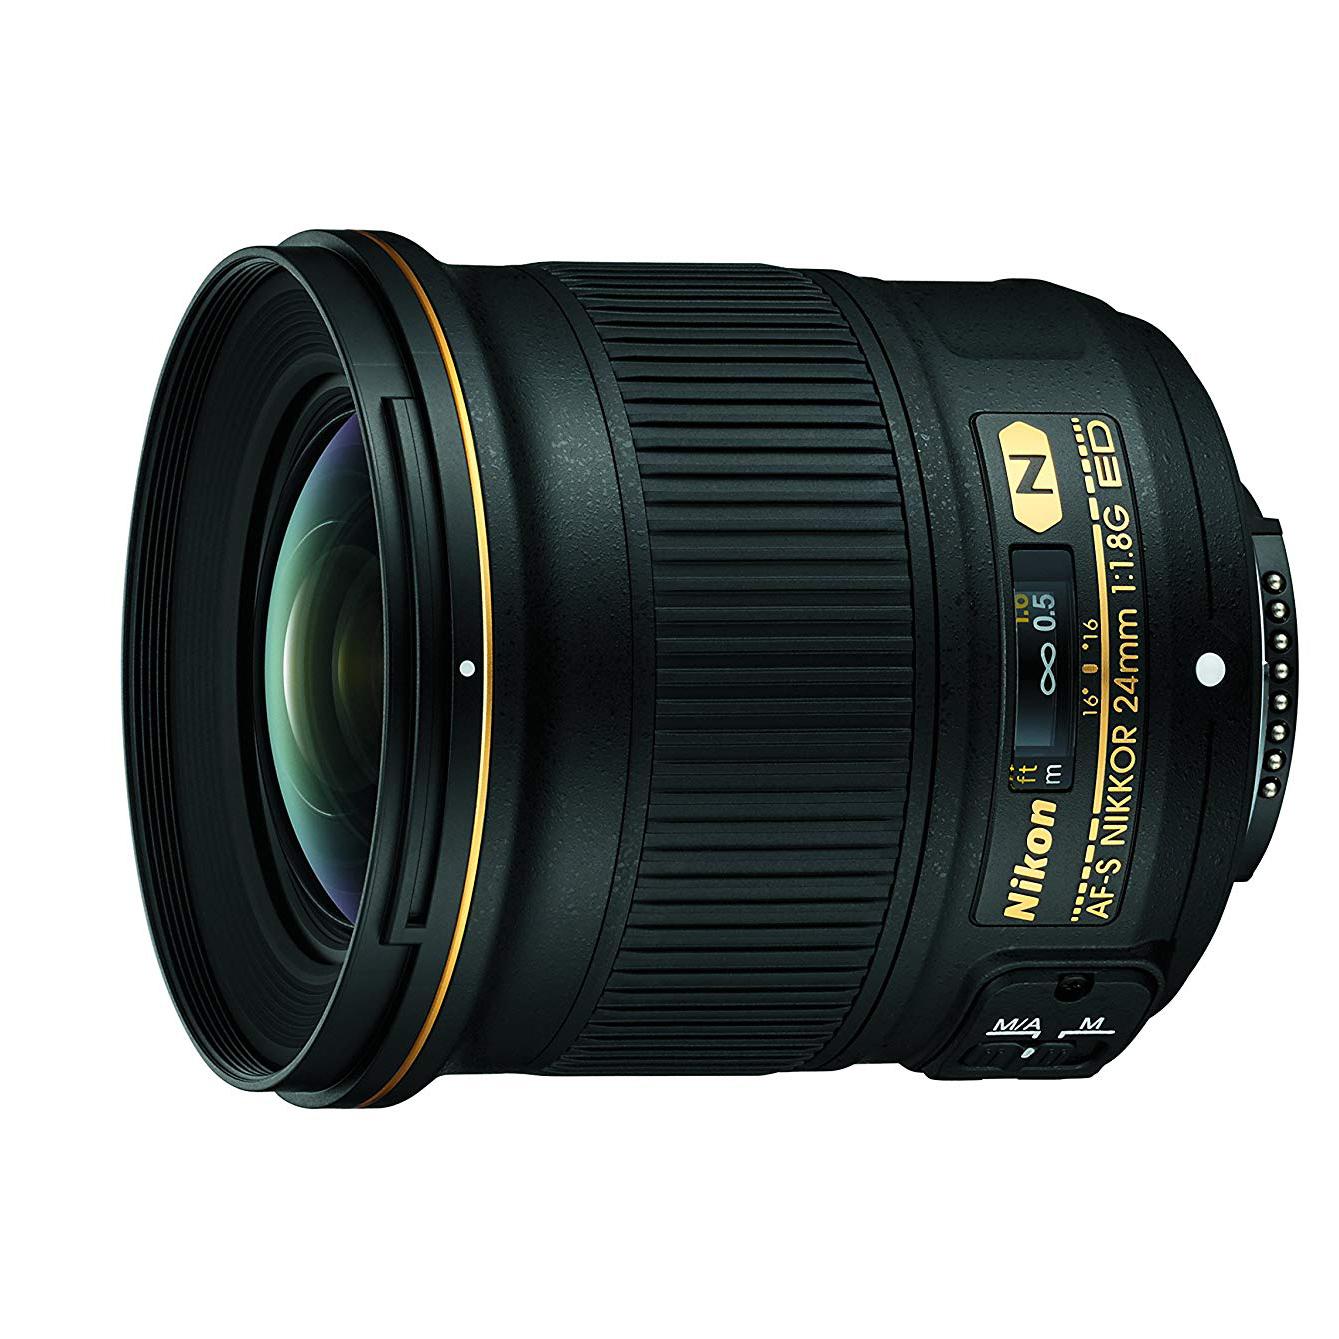 nikon-24mm-1.8-lens